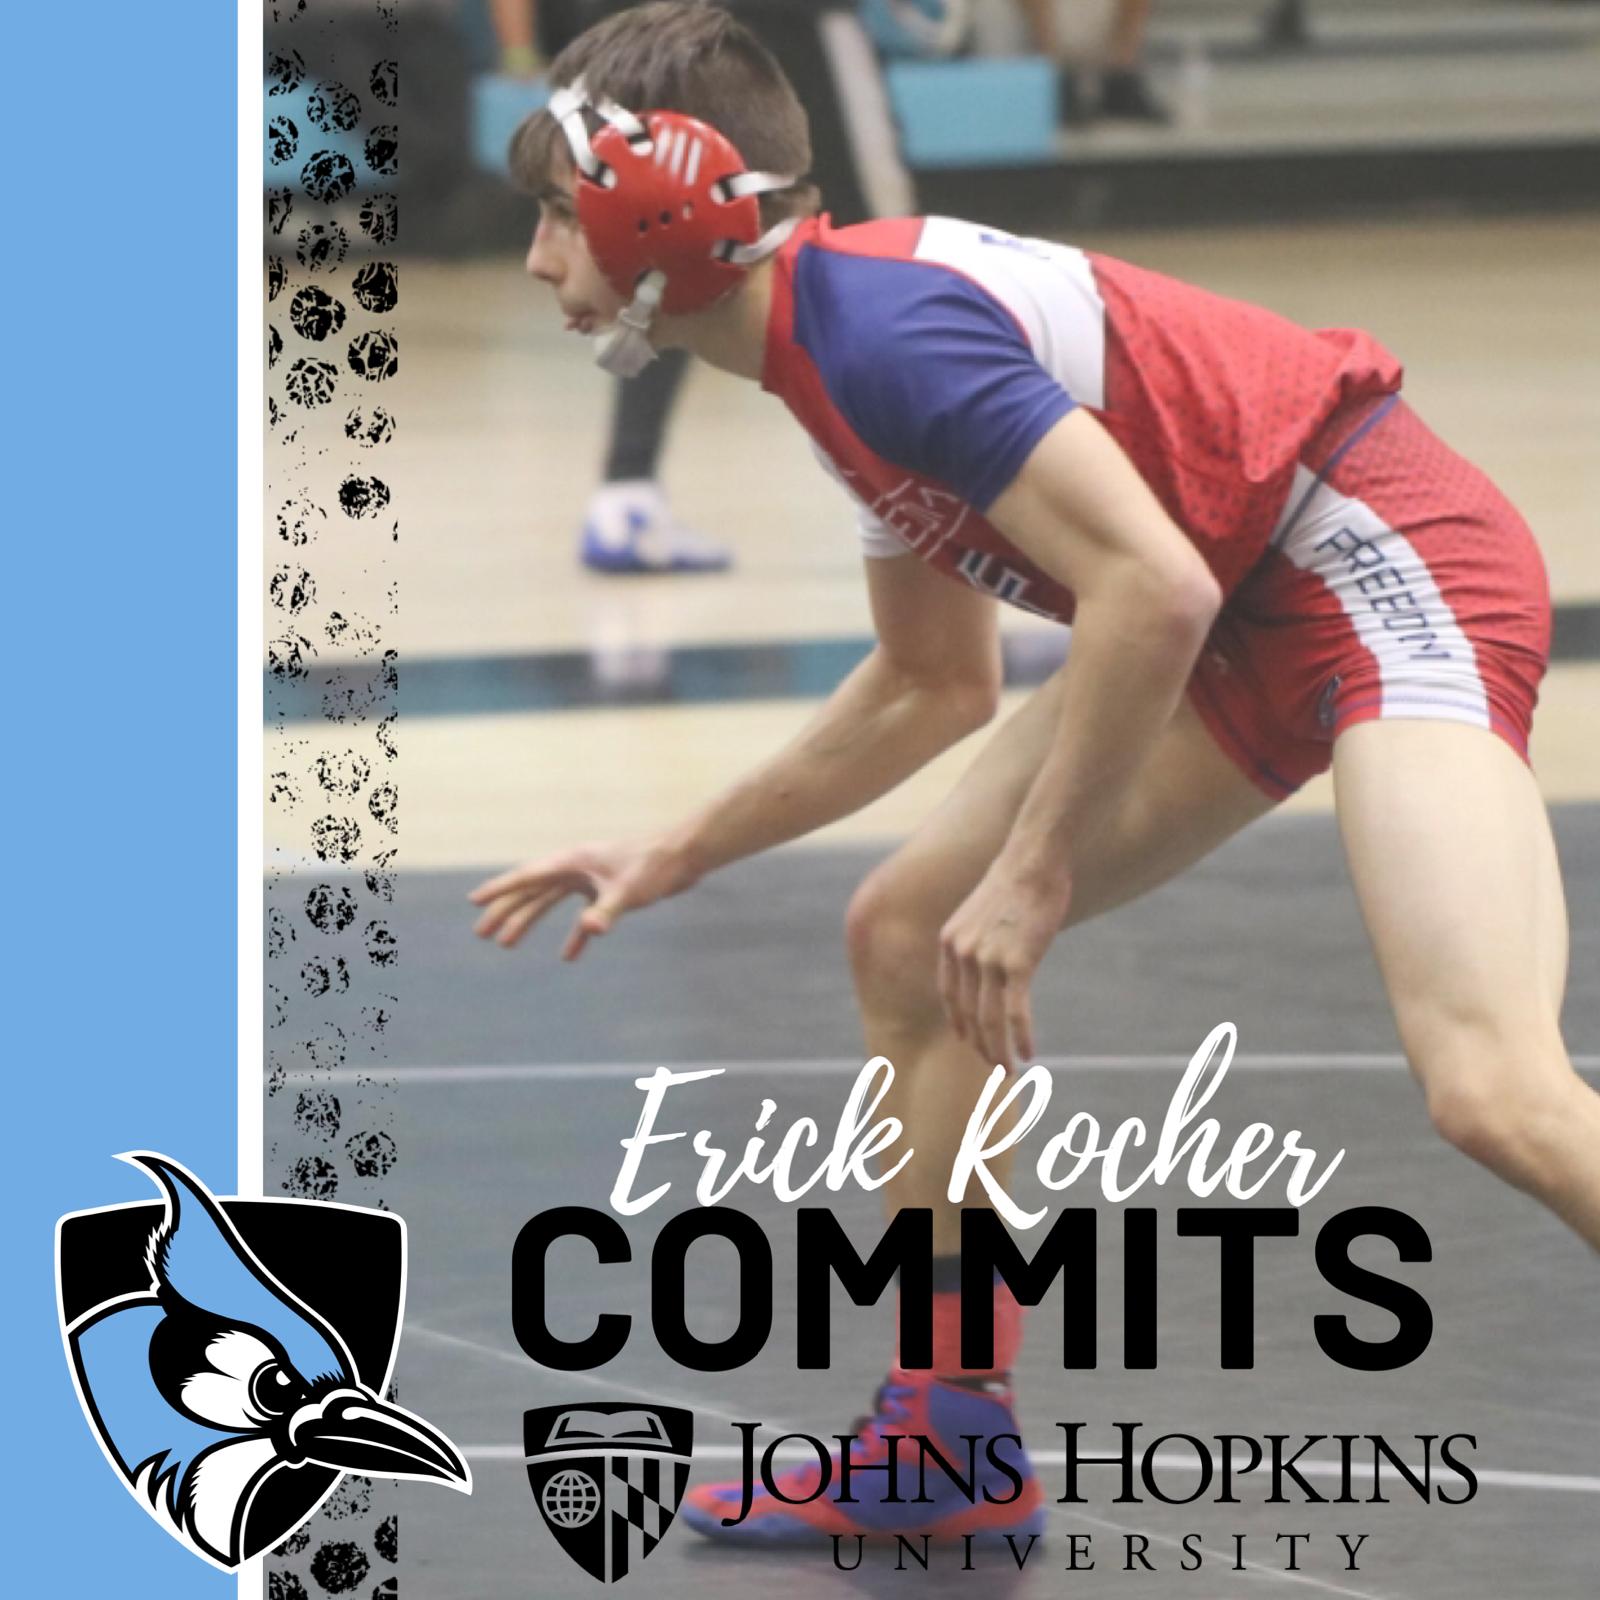 Erick Rocher Commits to Johns Hopkins University